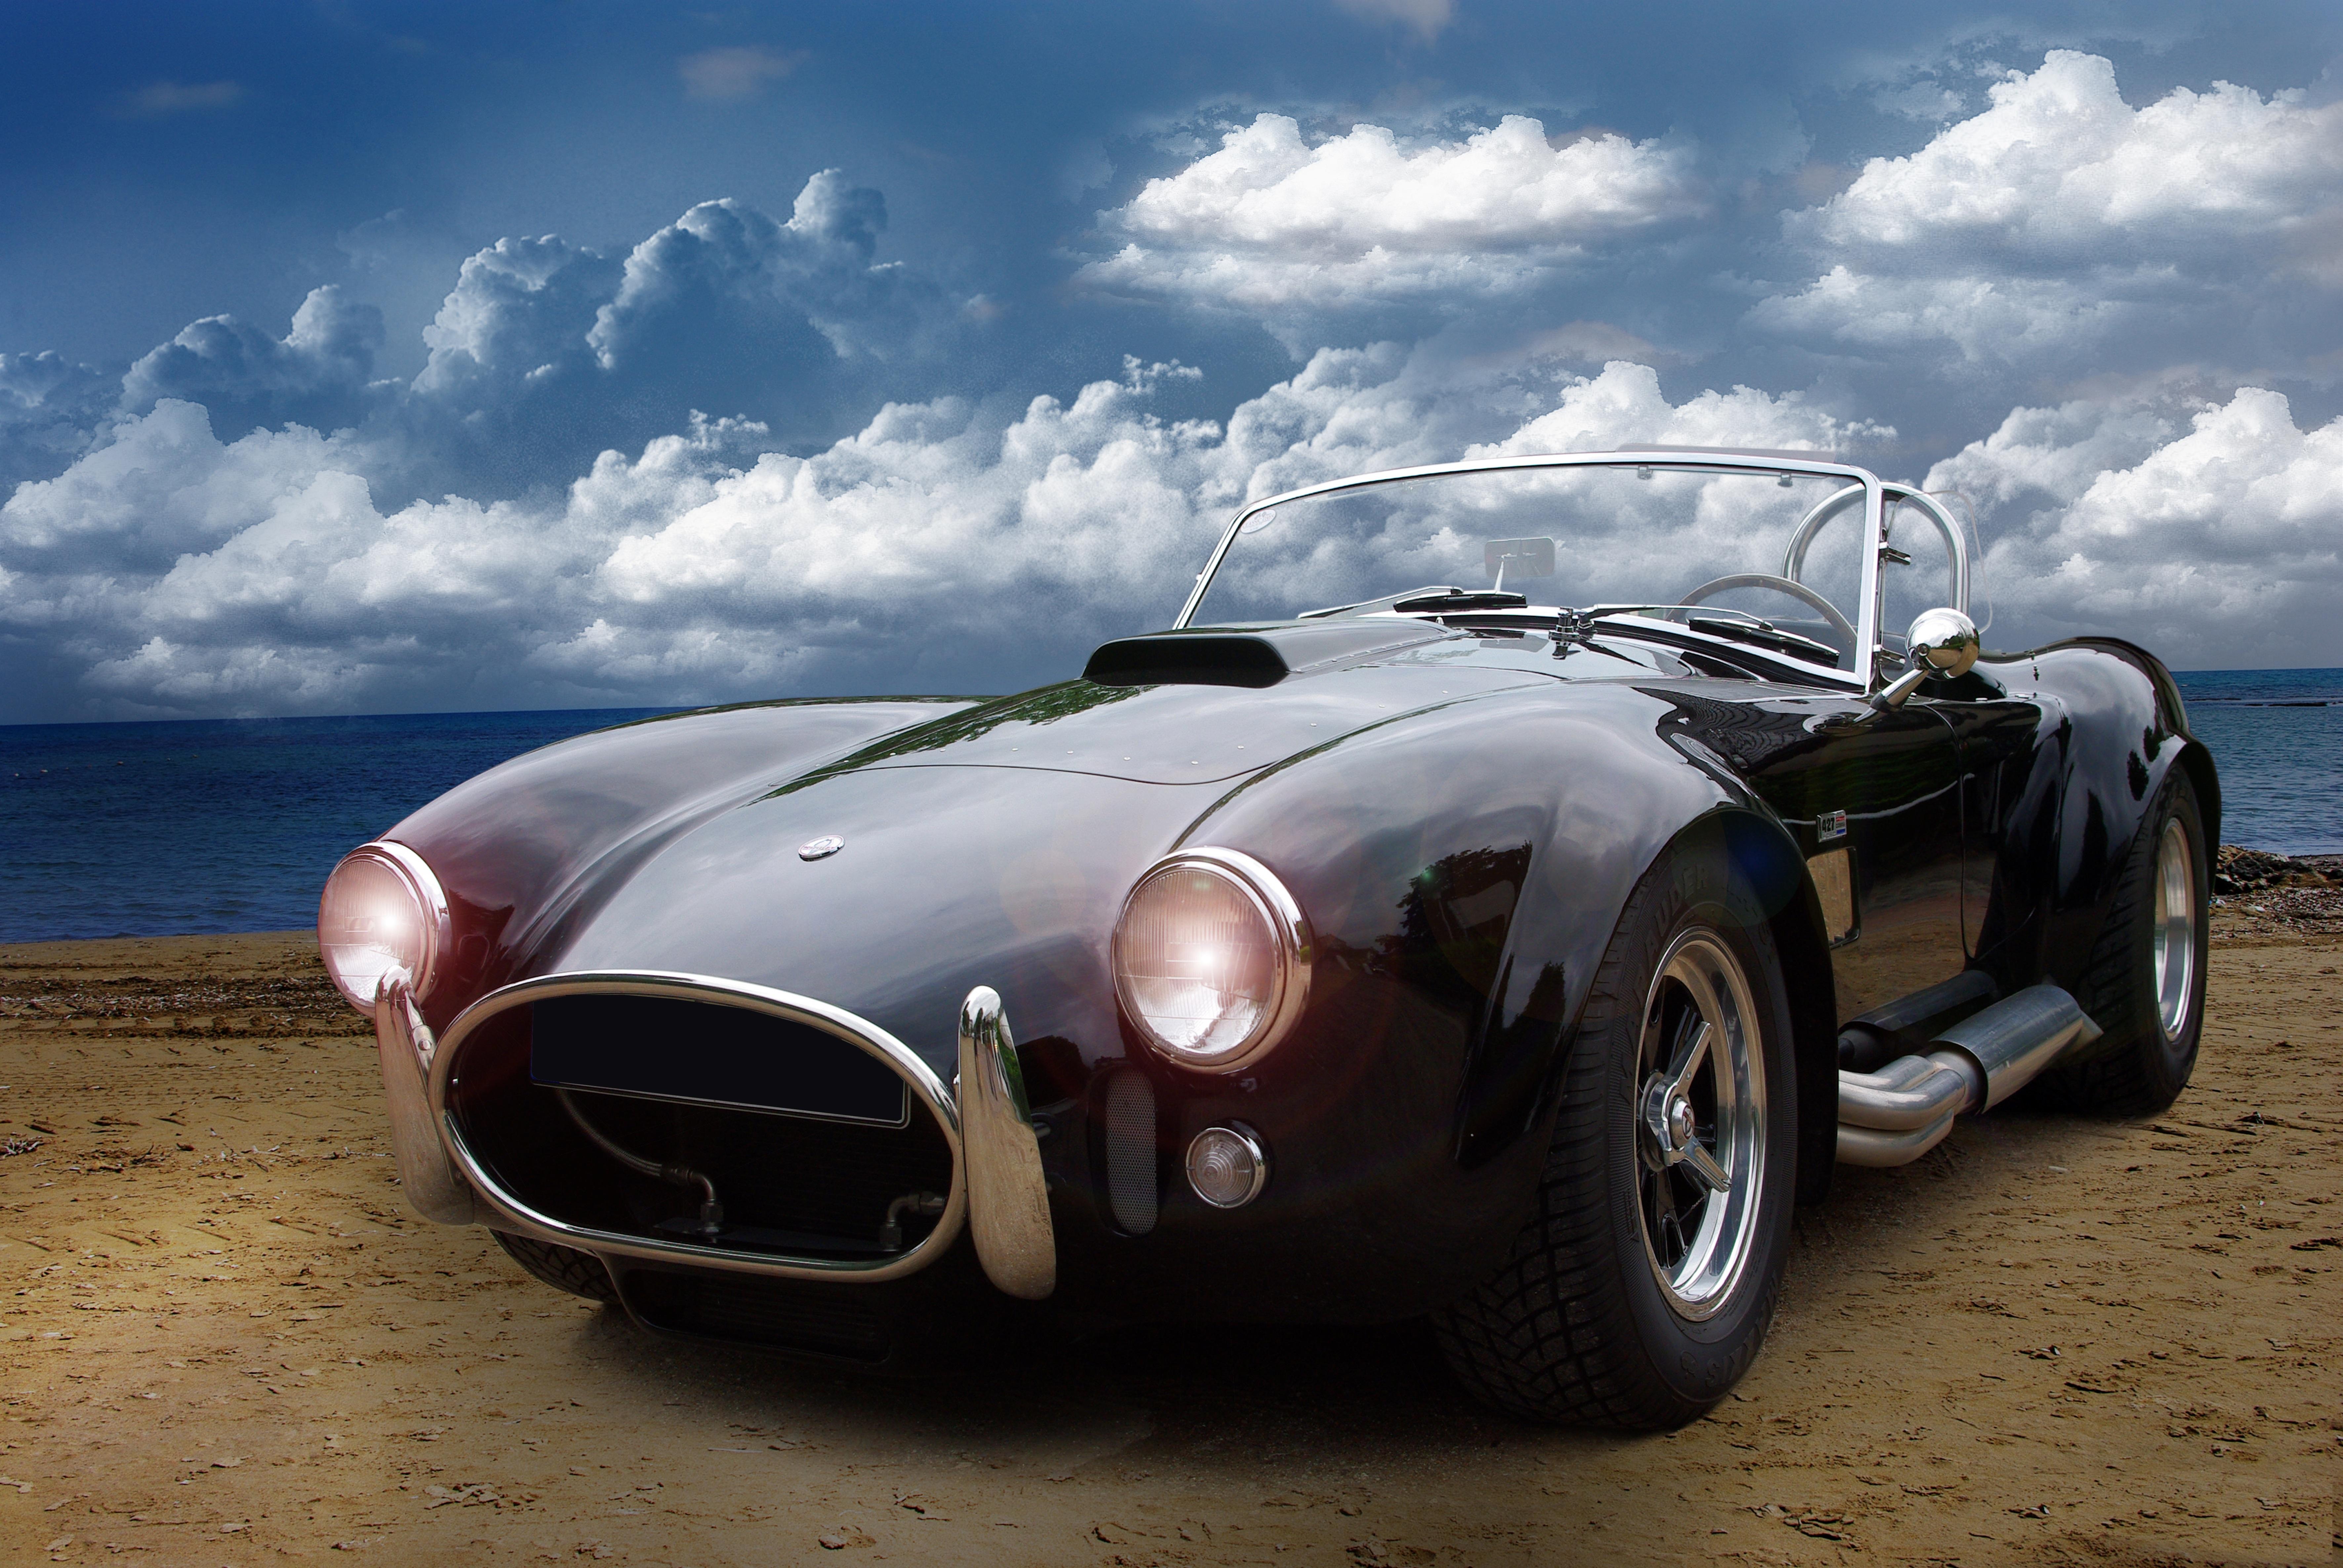 Car, Black, Classic, HQ Photo